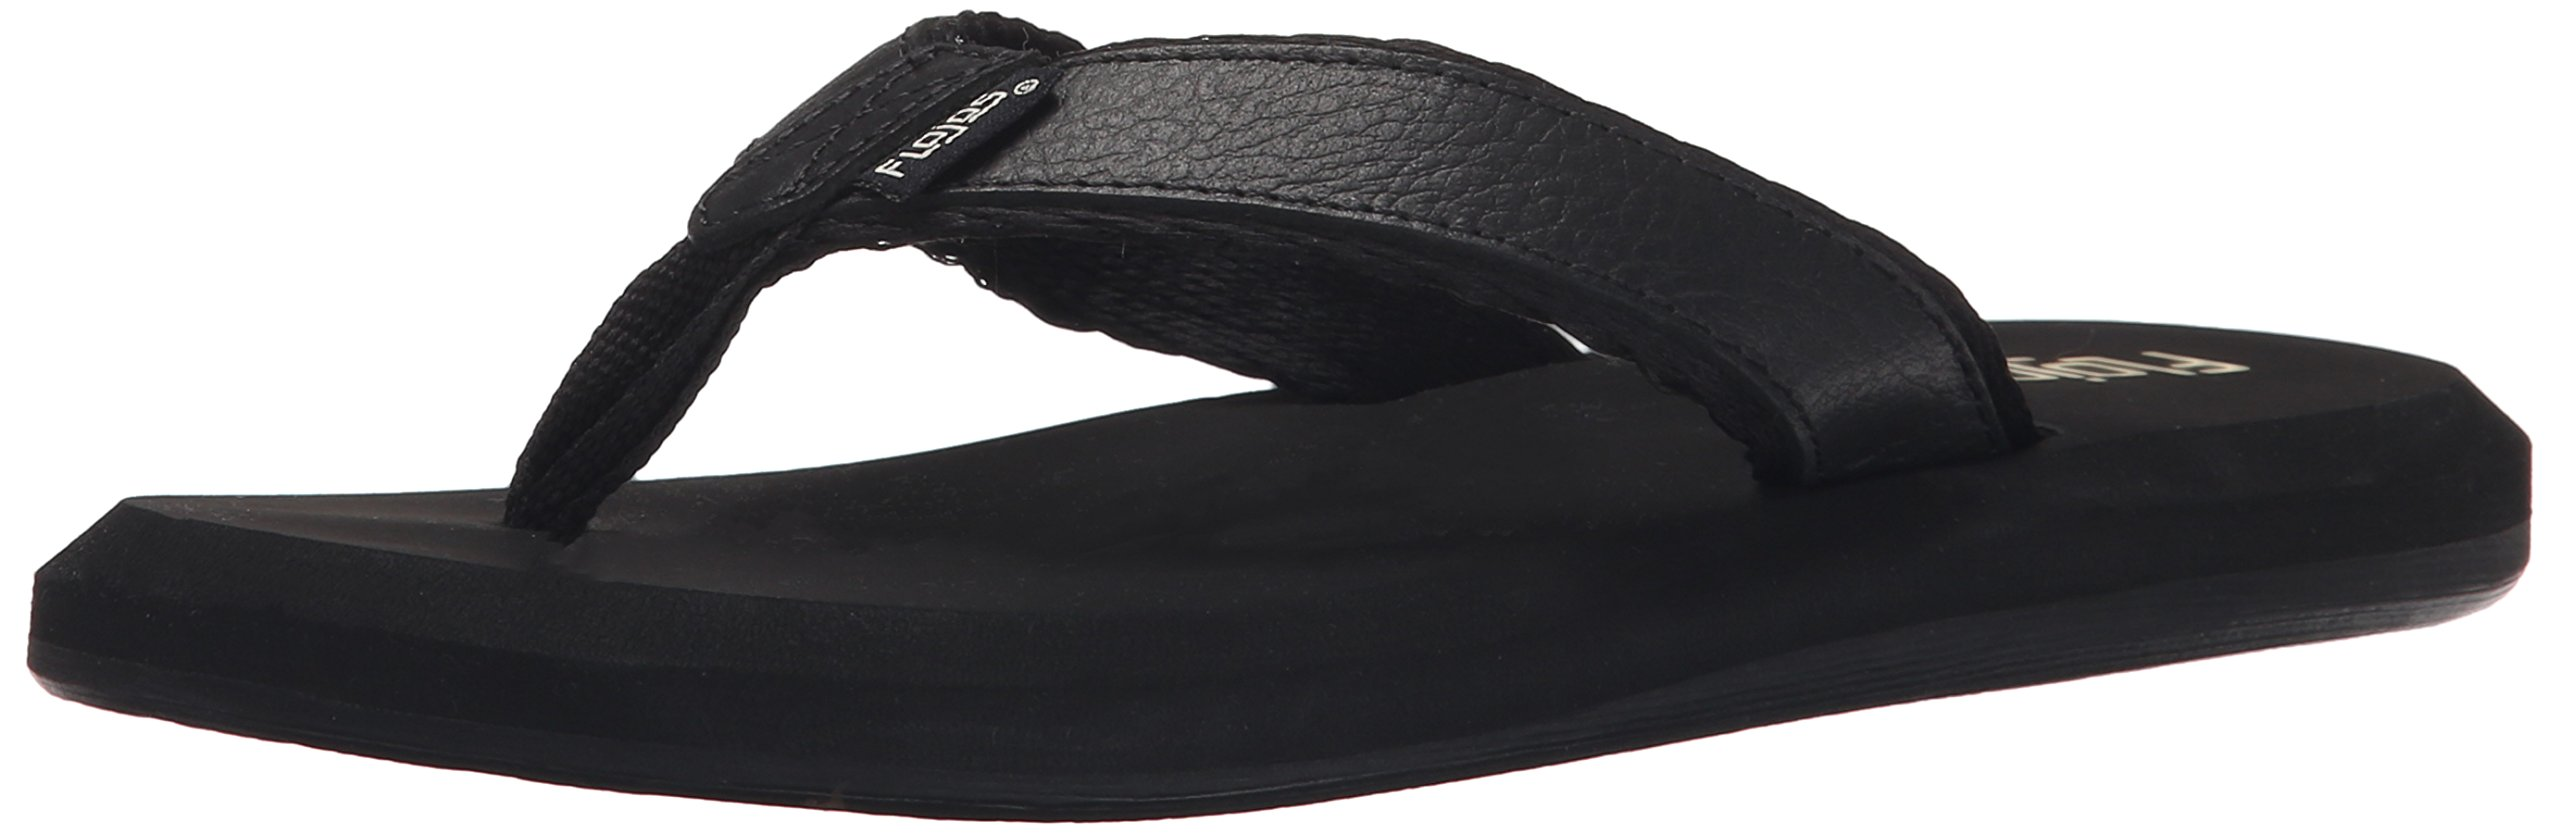 FLOJOS Women's Colette II Wedge Sandal, Black, 5 M US